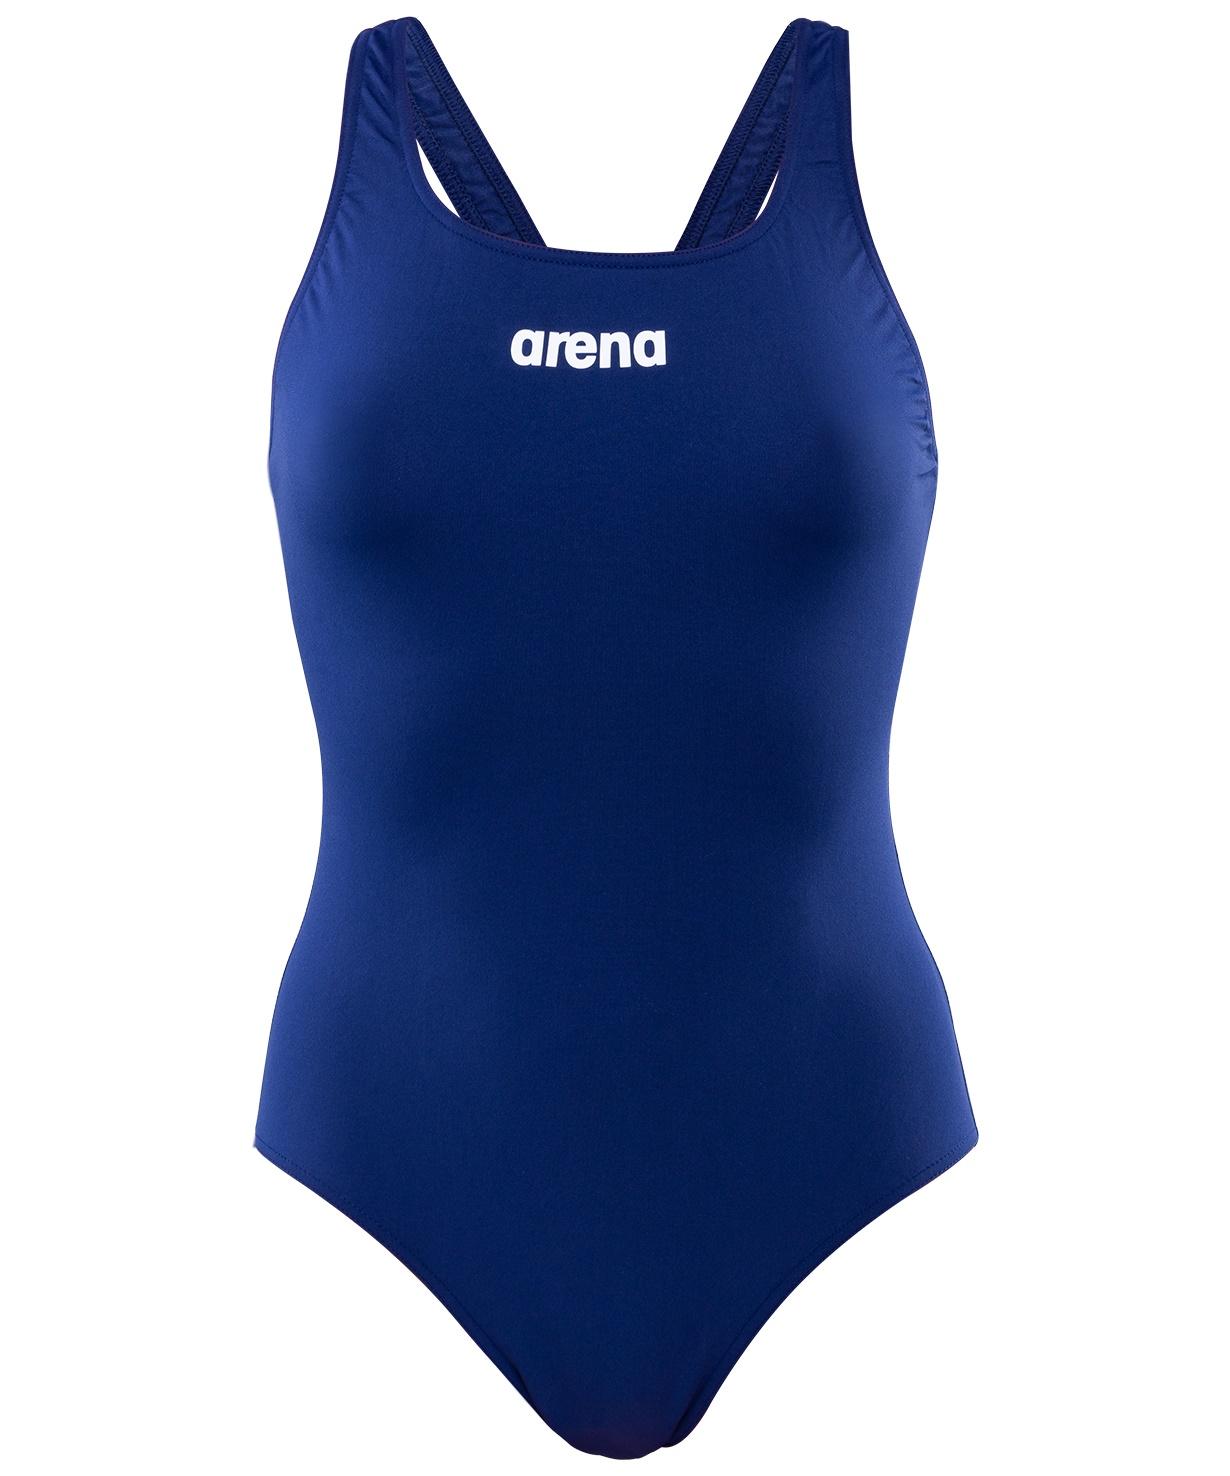 Купальник совместный Arena Solid Swim Pro Navy/White,